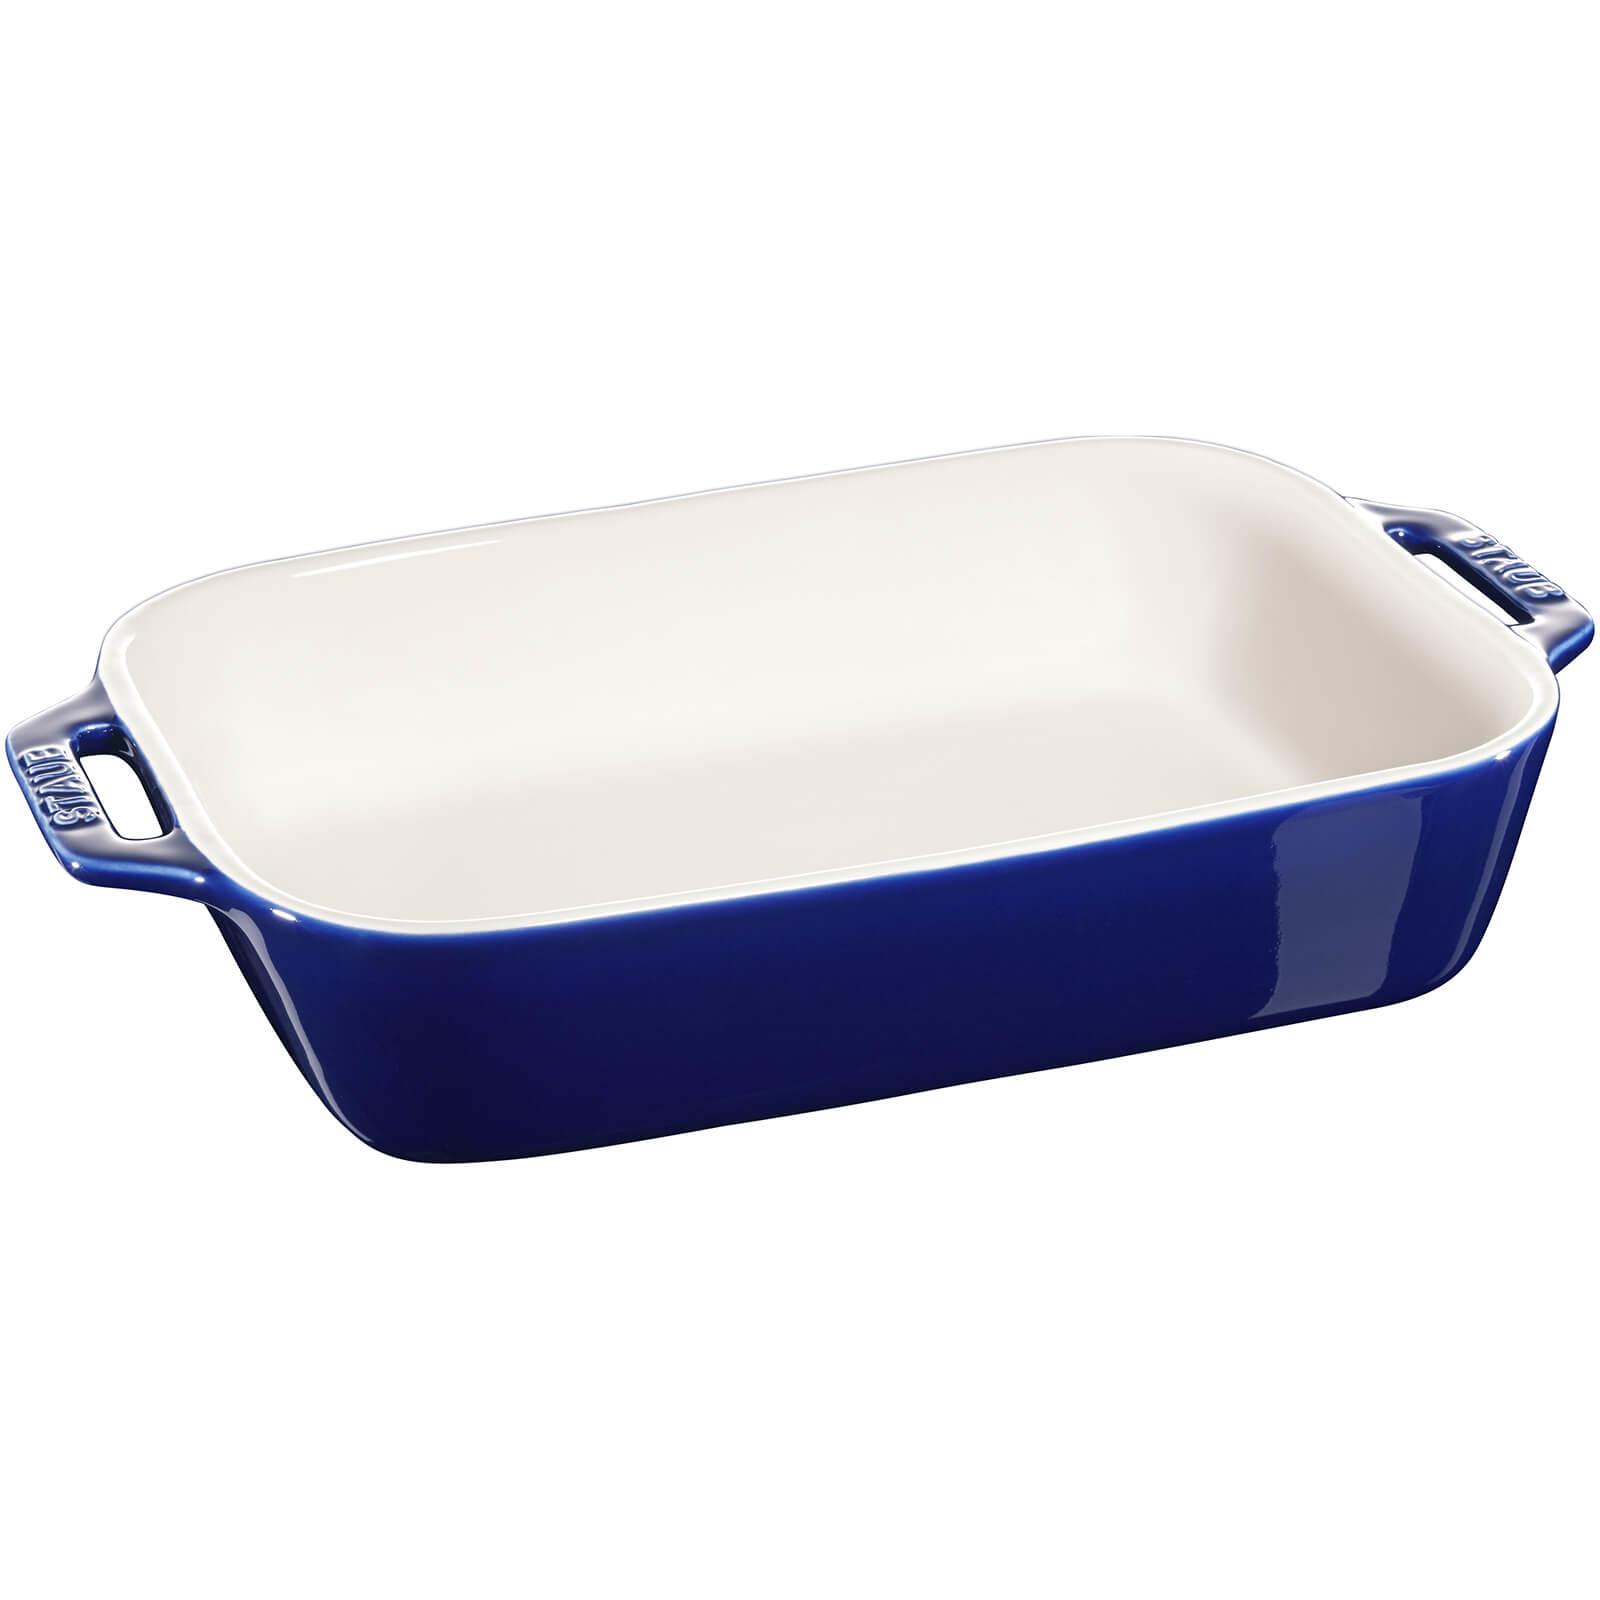 Staub Ceramic Rectangular Gratin Dish - 27cm x 20cm Dark Blue